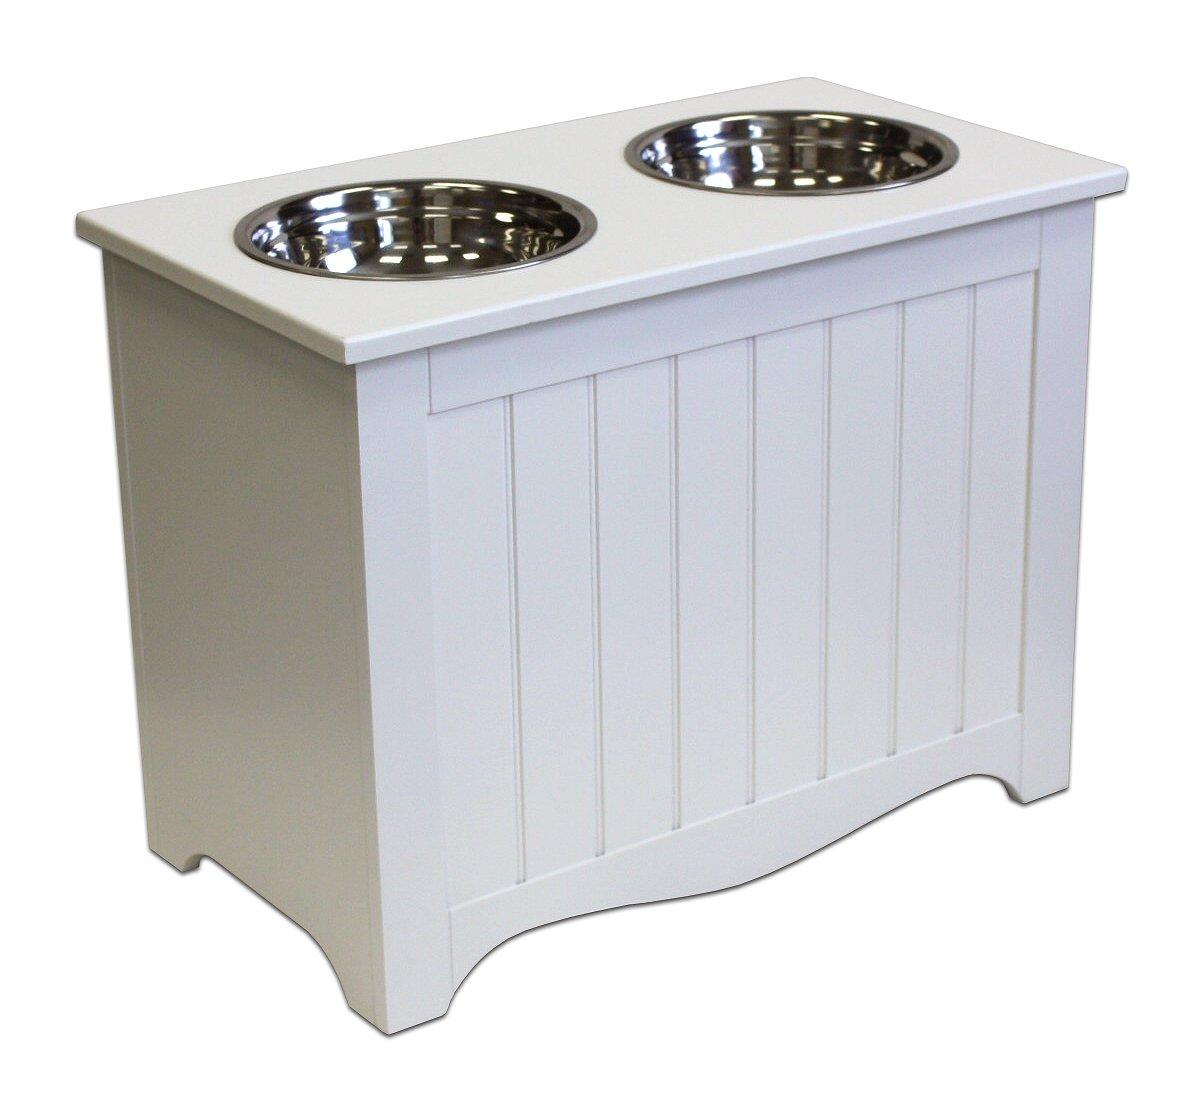 APetProject Large Pet Food Server & Storage Box (Winter White)LIMIT 1 PER ORDER